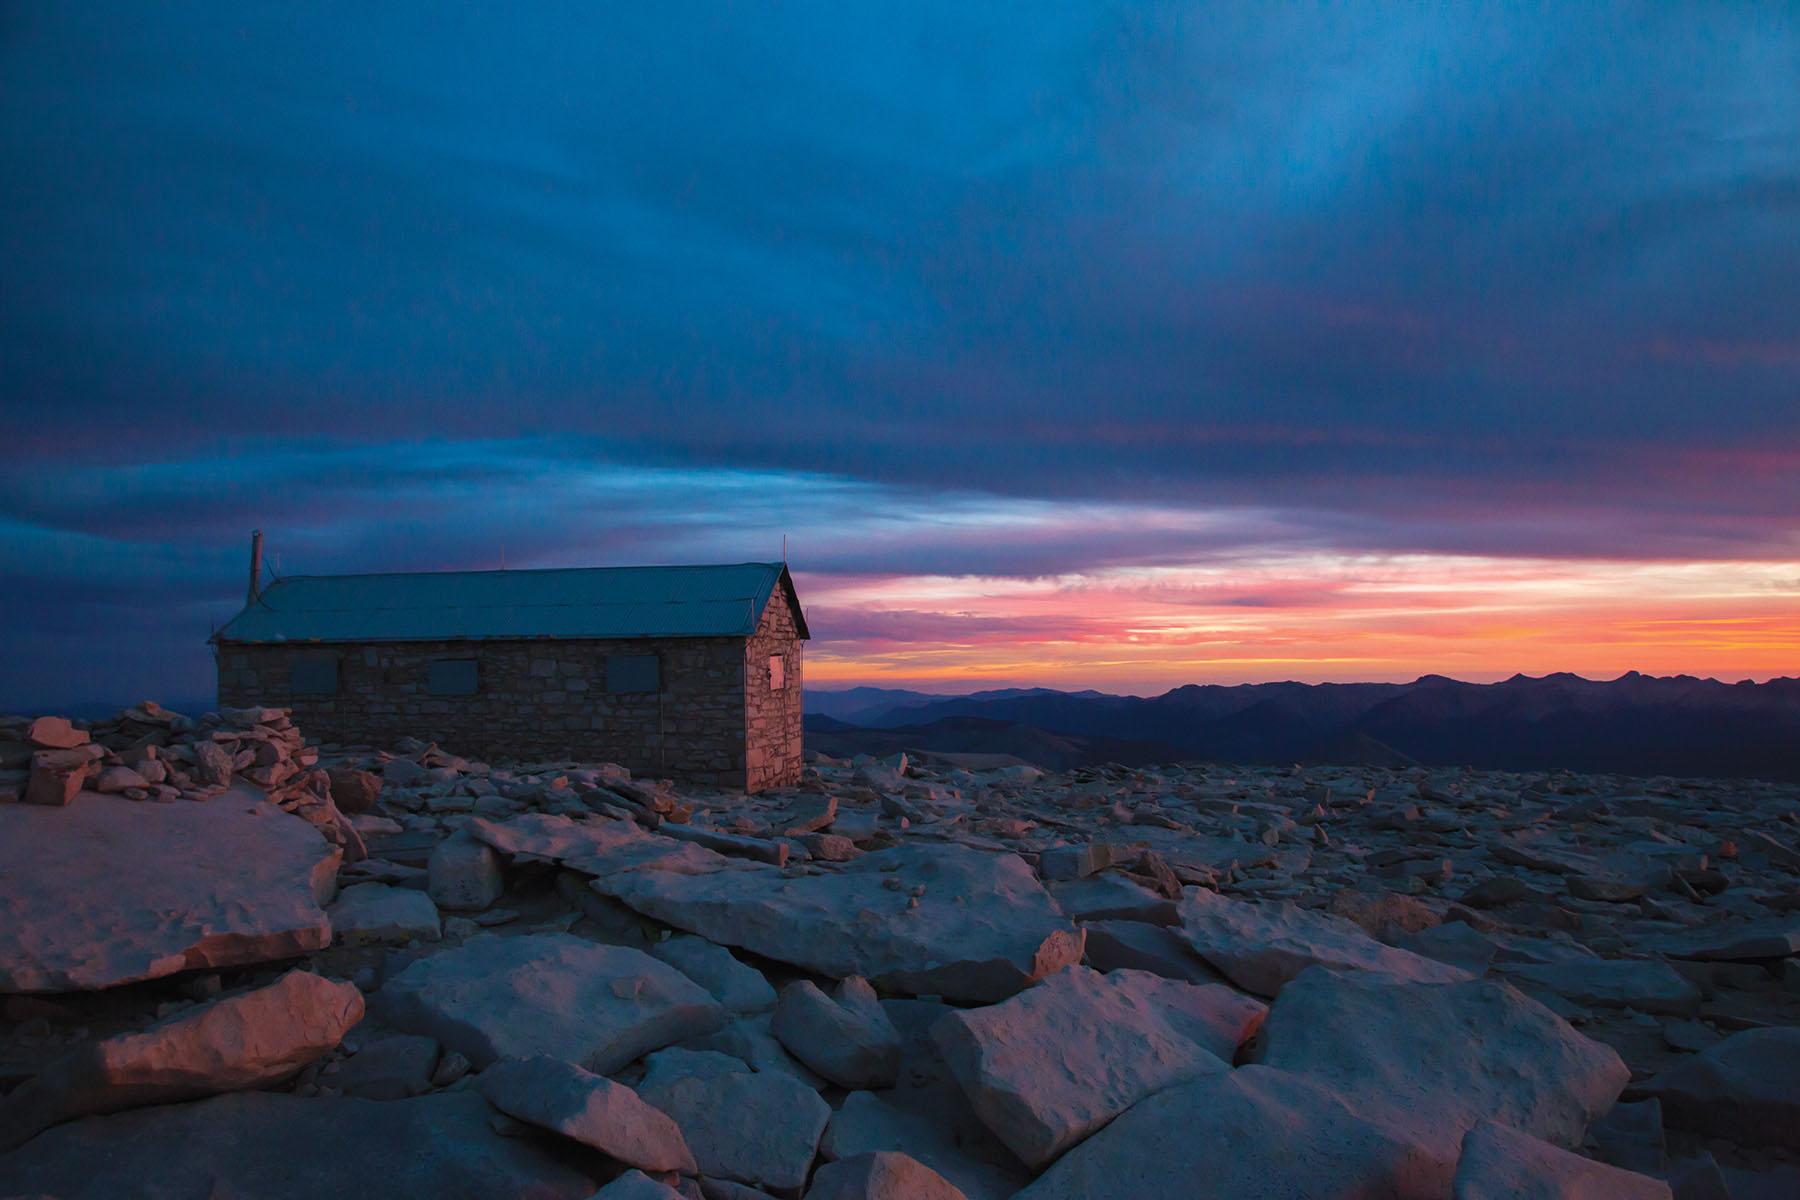 Sunset atop 14,505 ft. Mt. Whitney